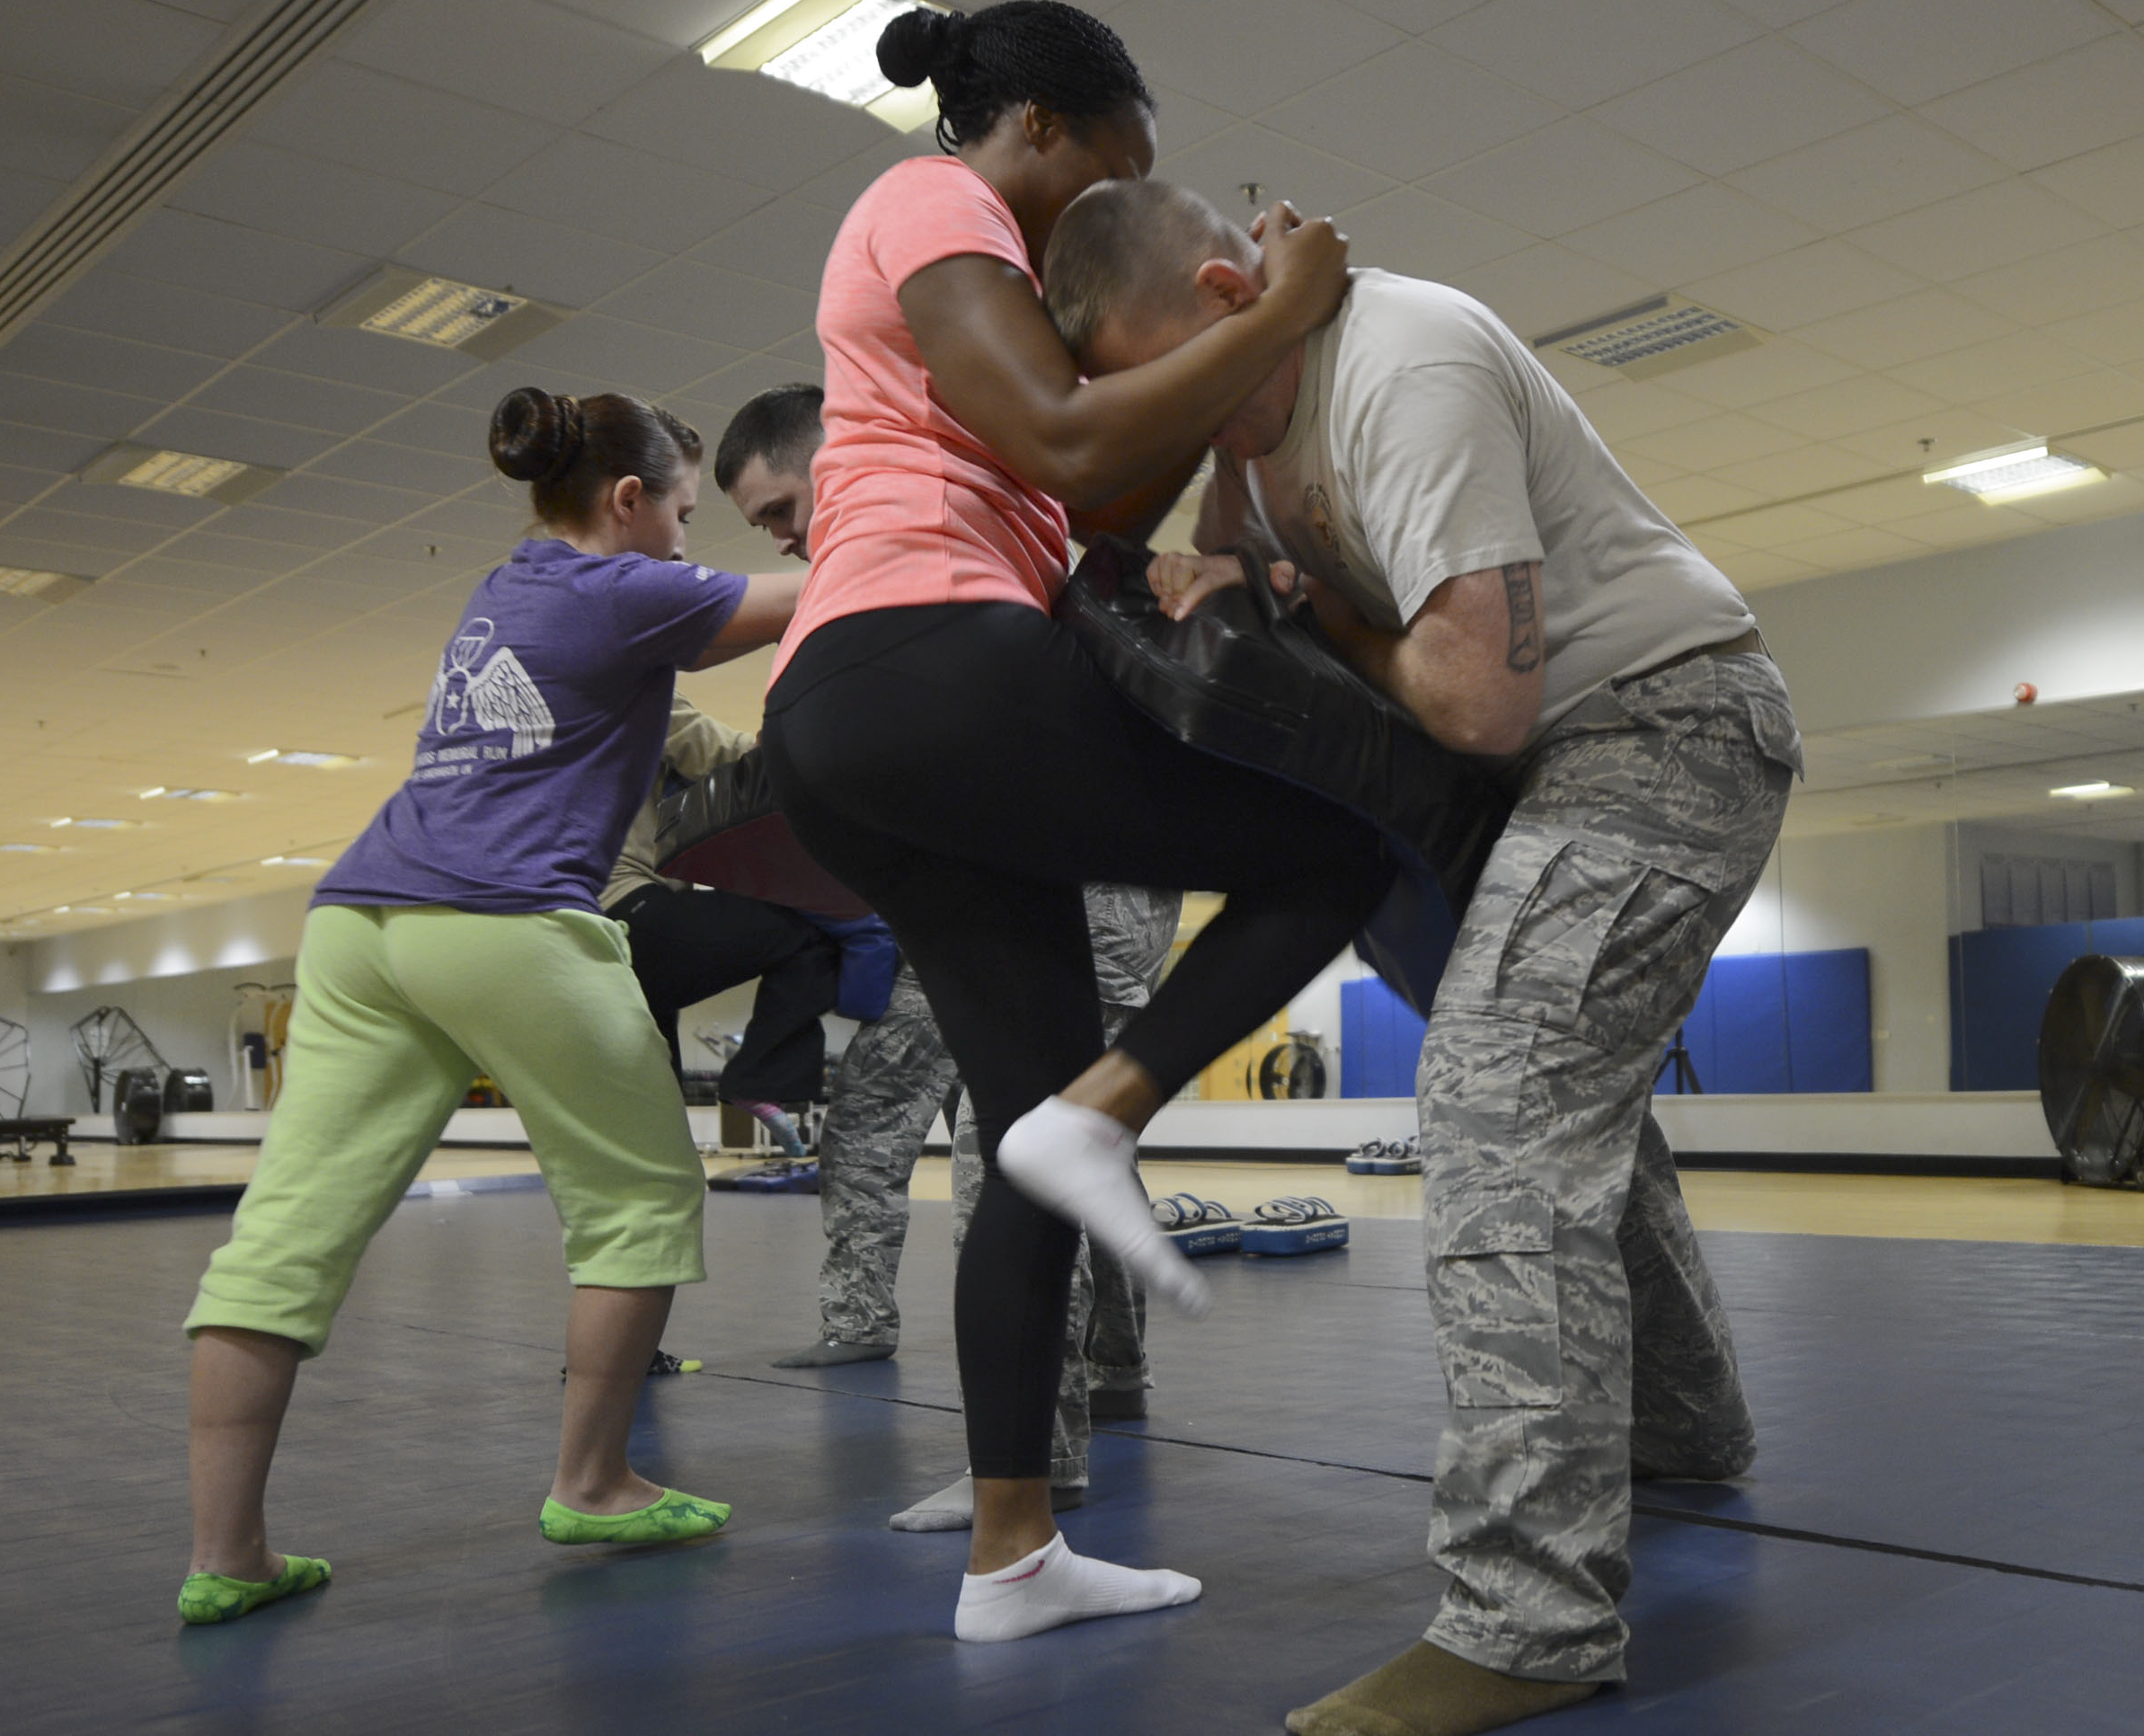 Lakenheath Women Learn Self-defense Skills, Build Confidence